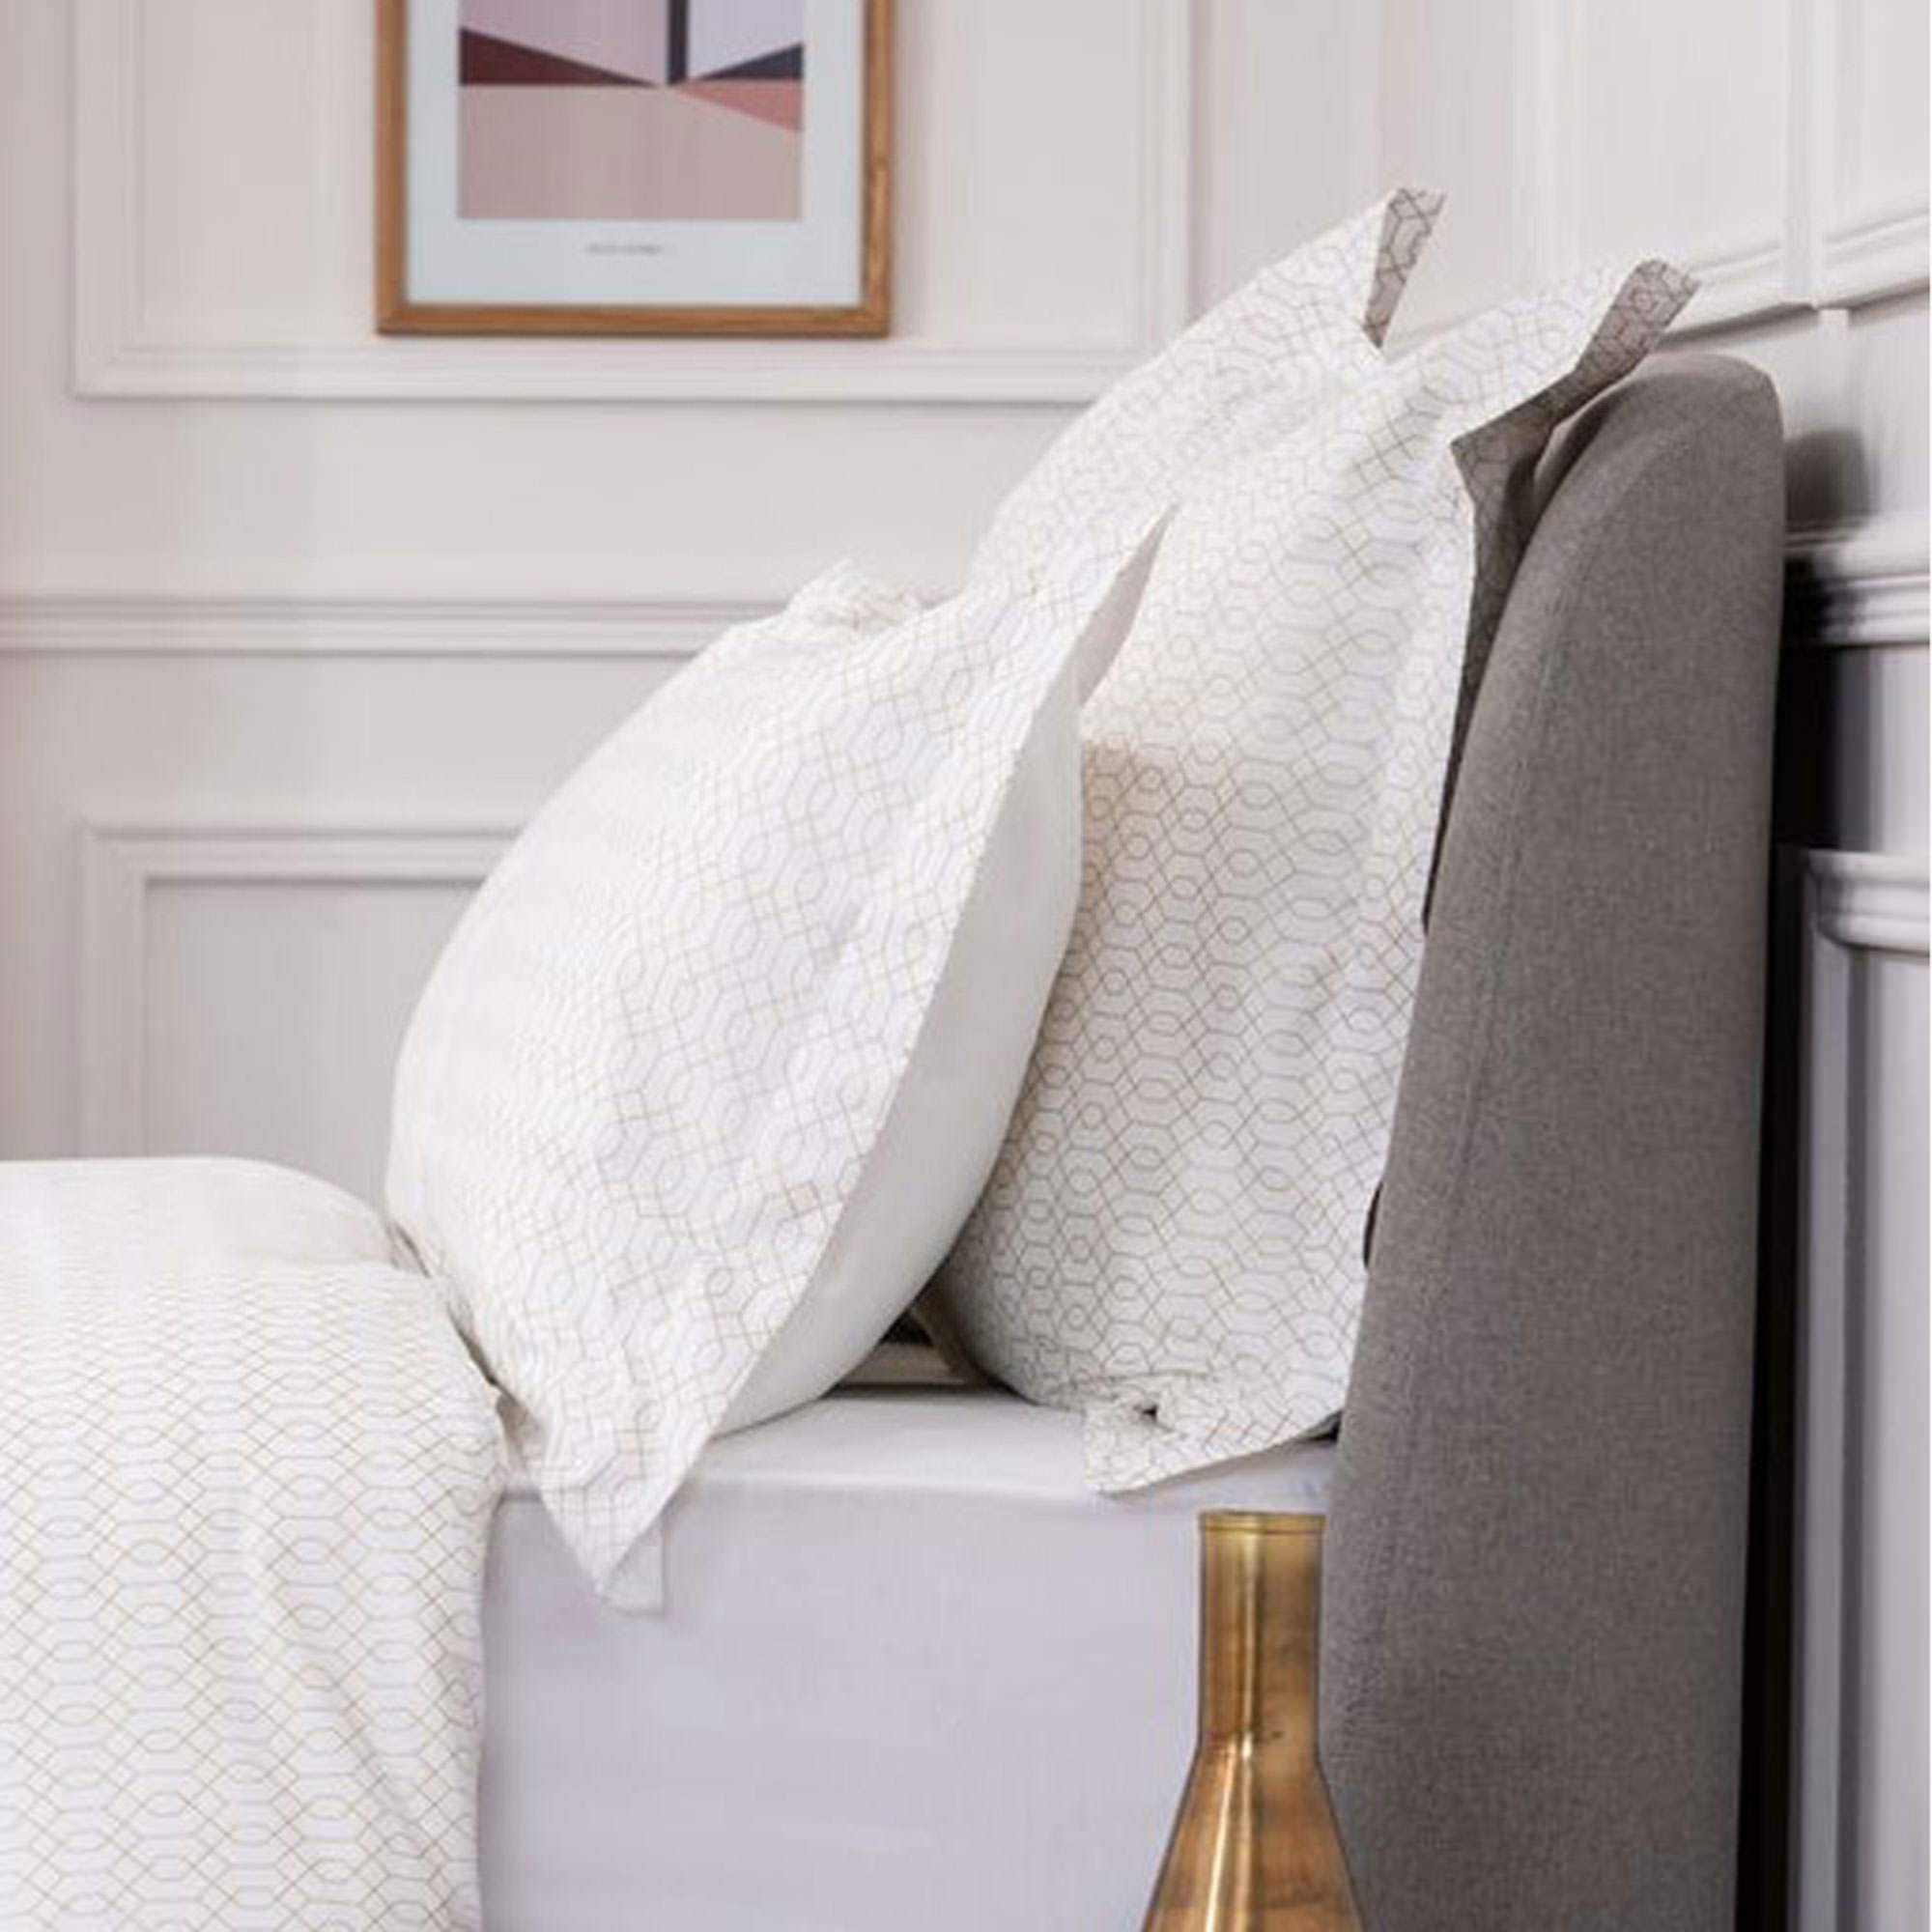 5617GEOMETALLICOXPCGOLDWH: Geometric Oxford Pillowcase